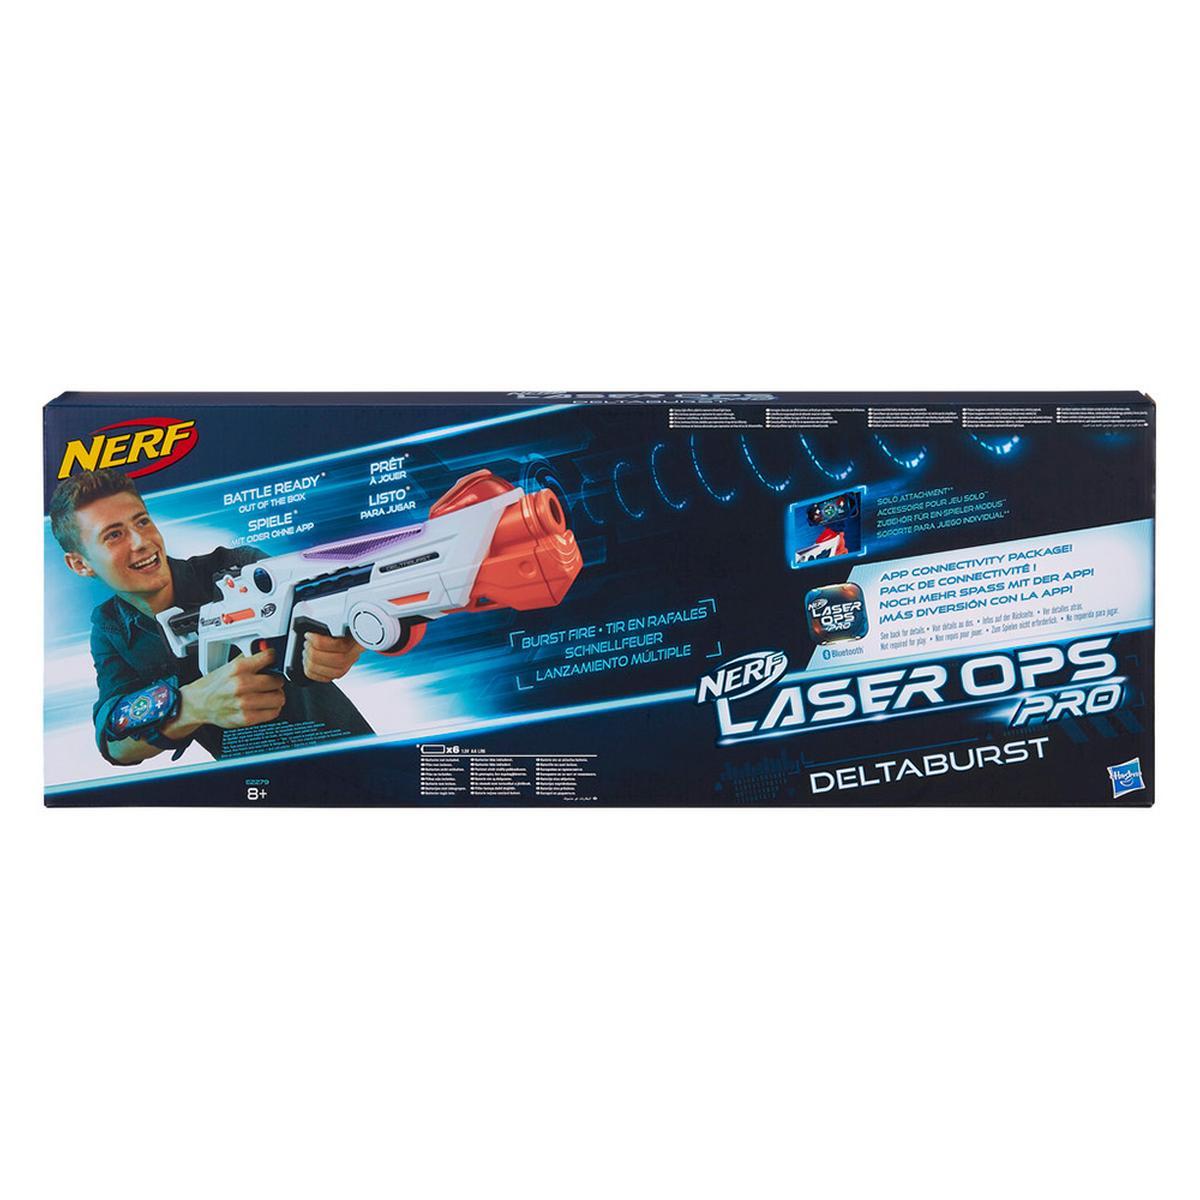 dc3922cc4 Nerf - Deltaburst | LASER BLASTER | Loja de brinquedos e videojogos ...